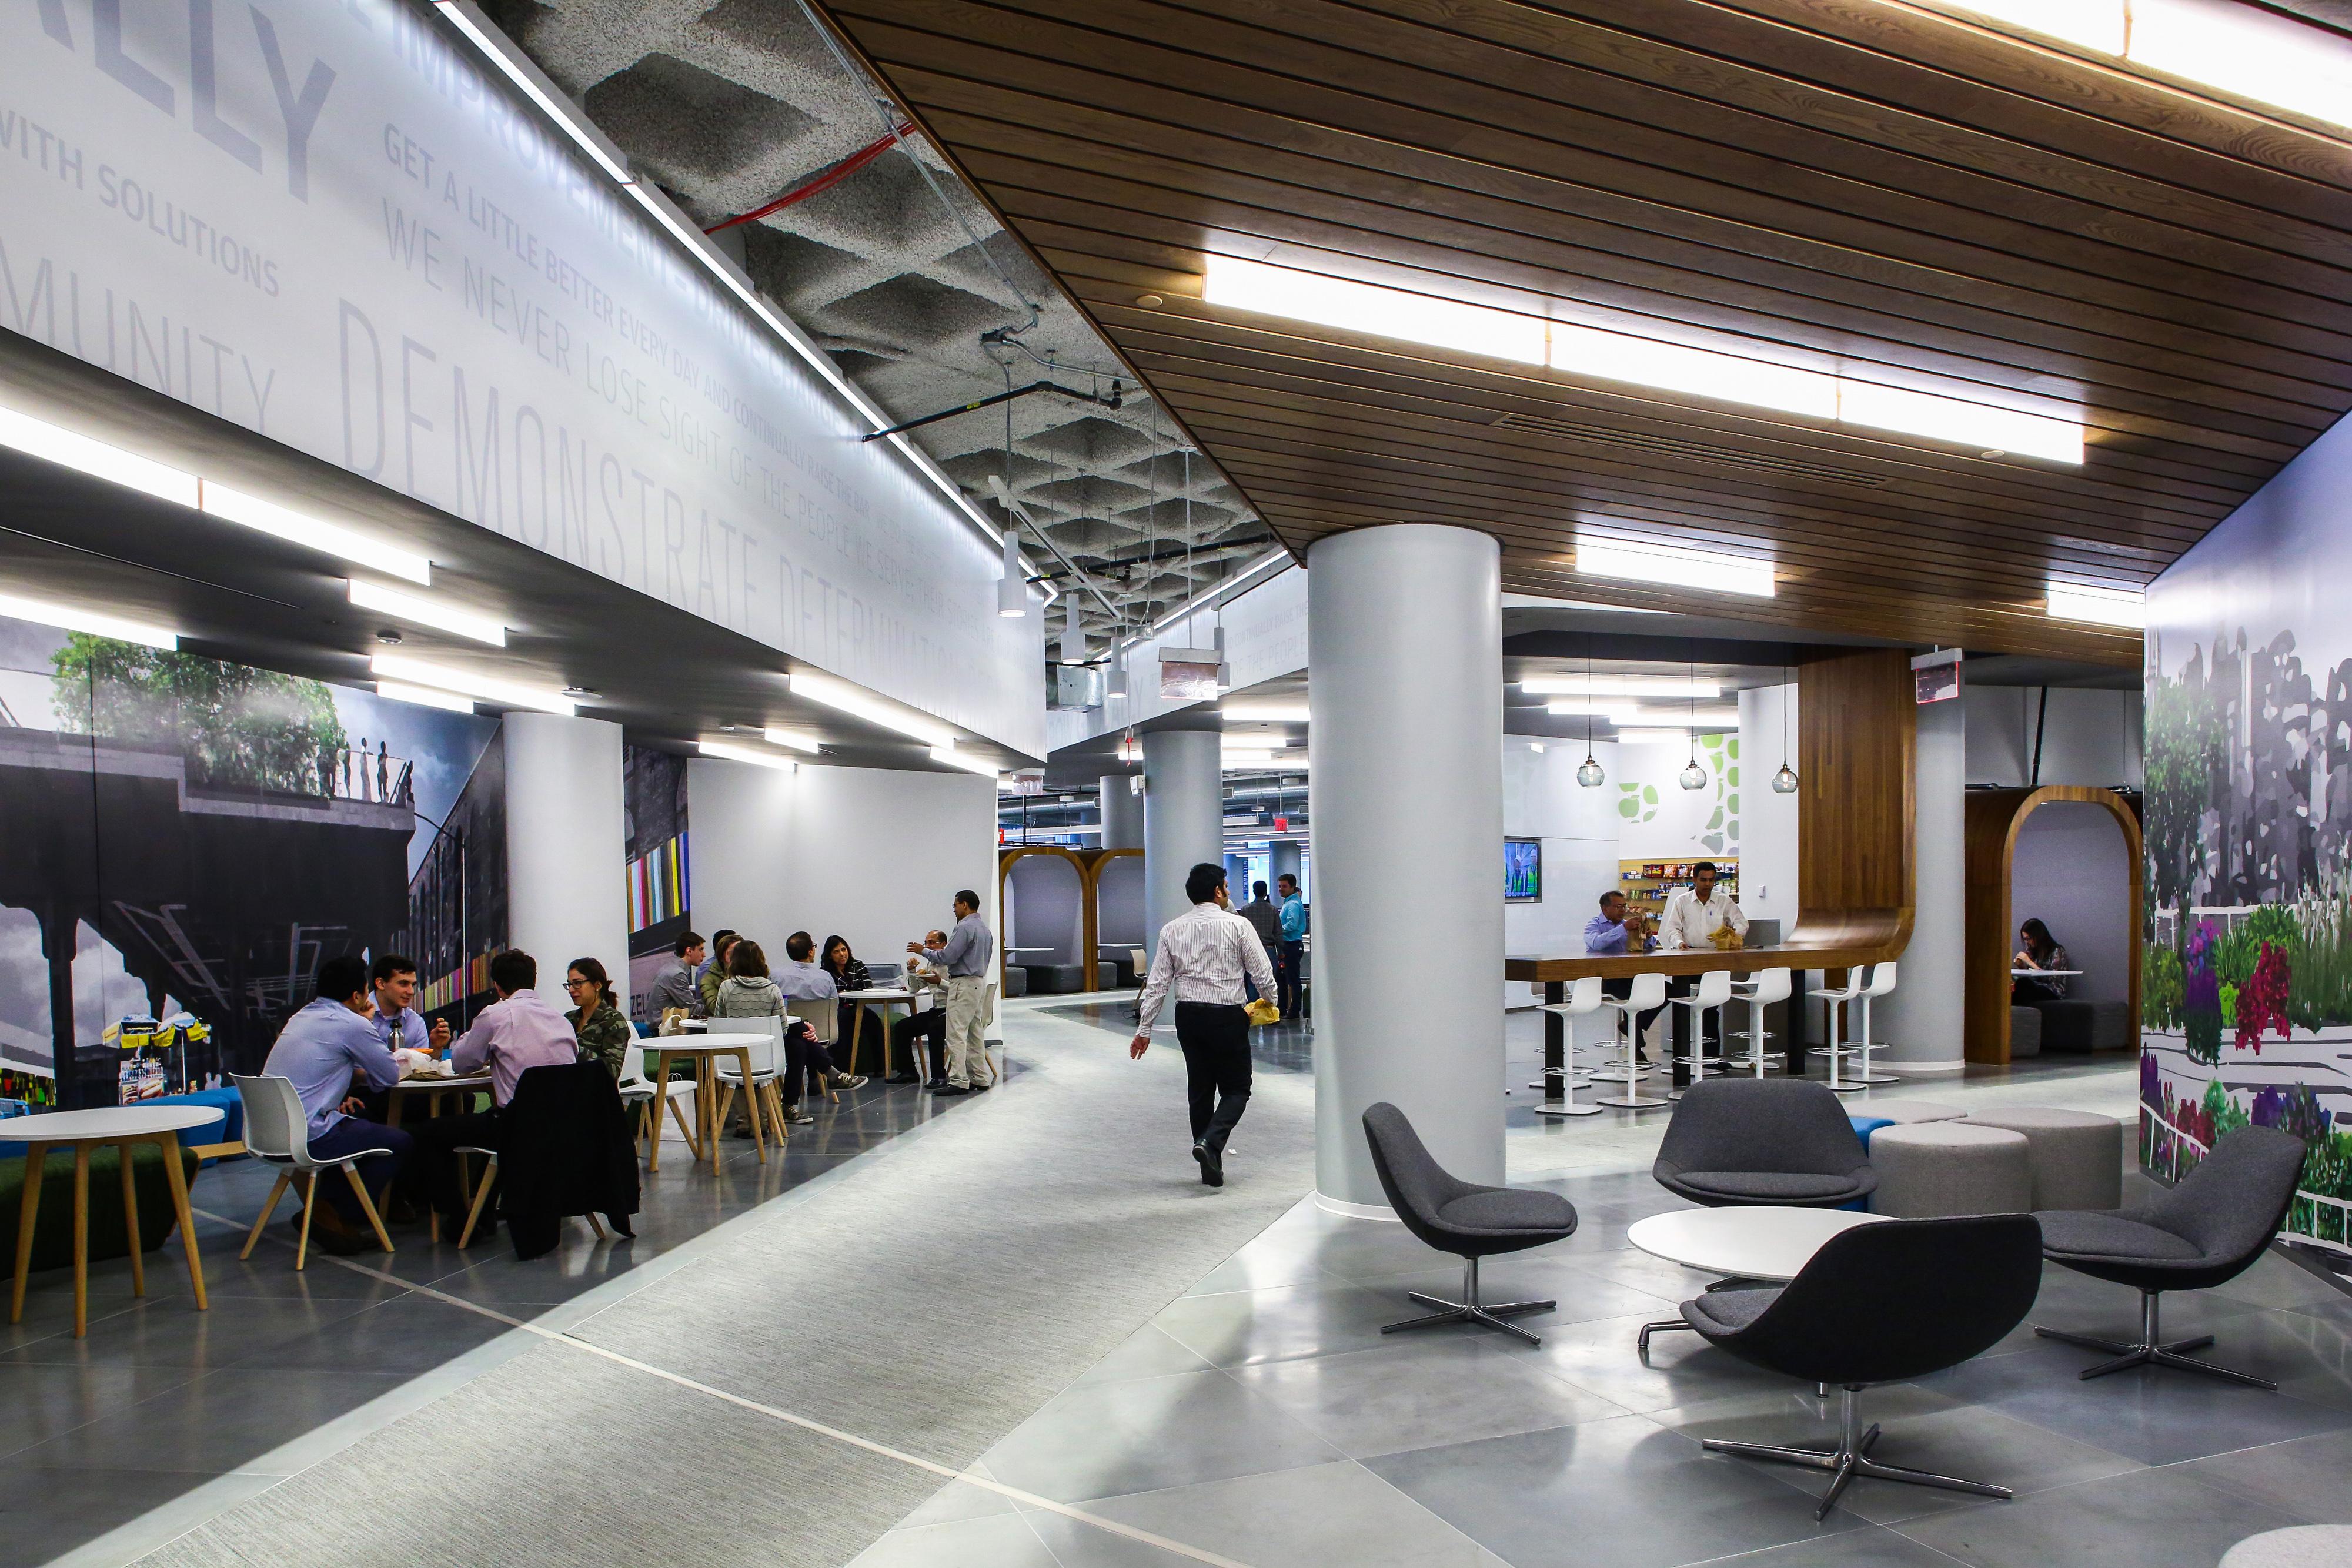 Inside JPMorgan Chase & Co.'s New Technology Hub